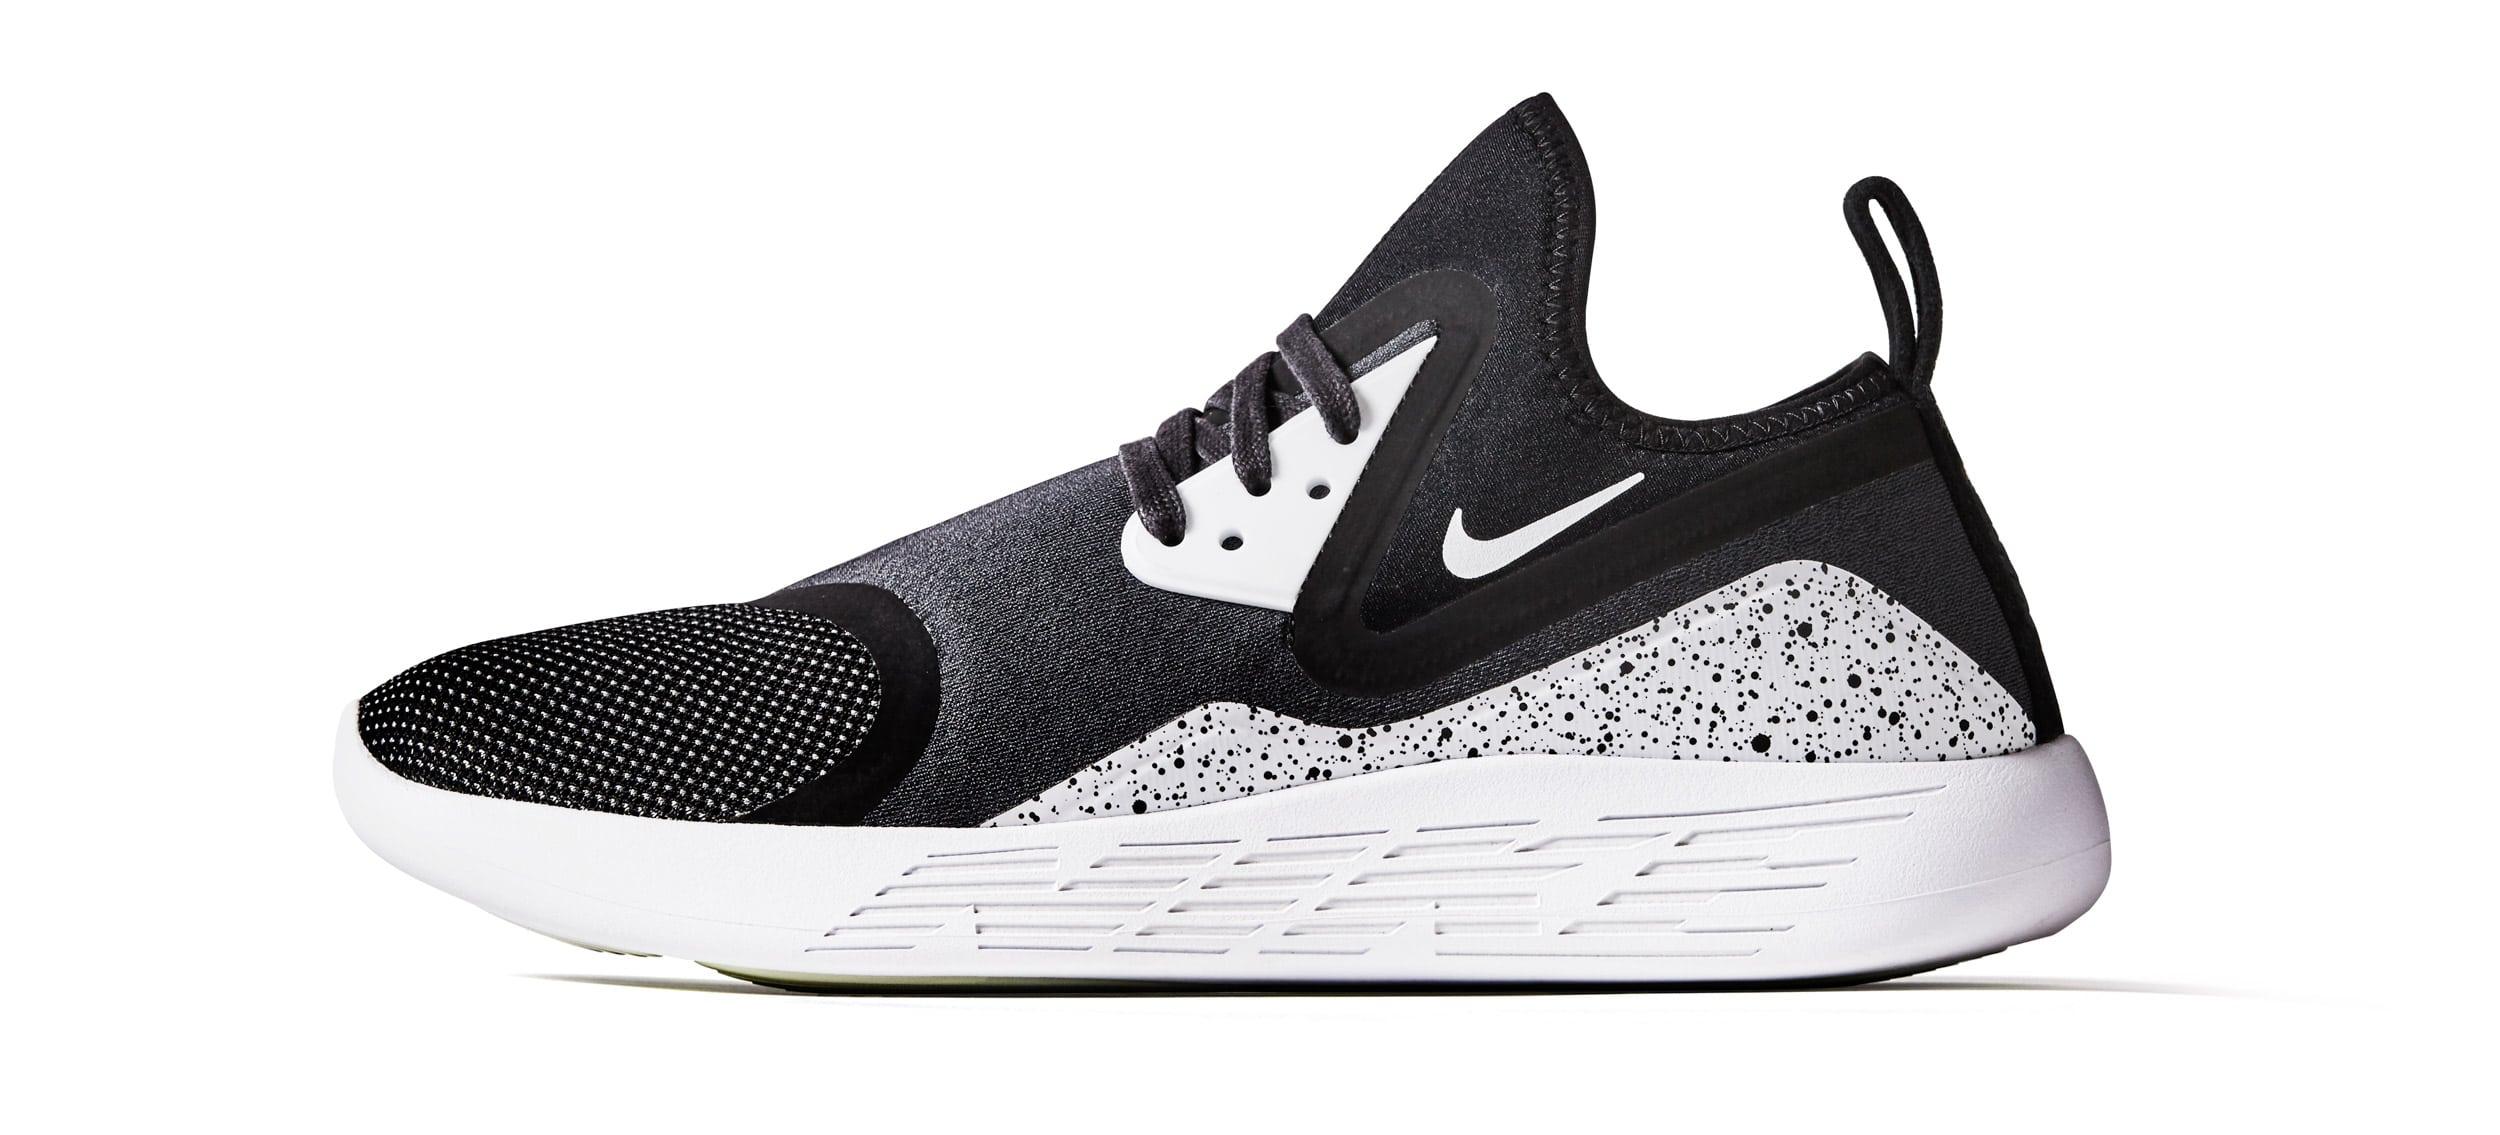 Nike LunarCharge 2